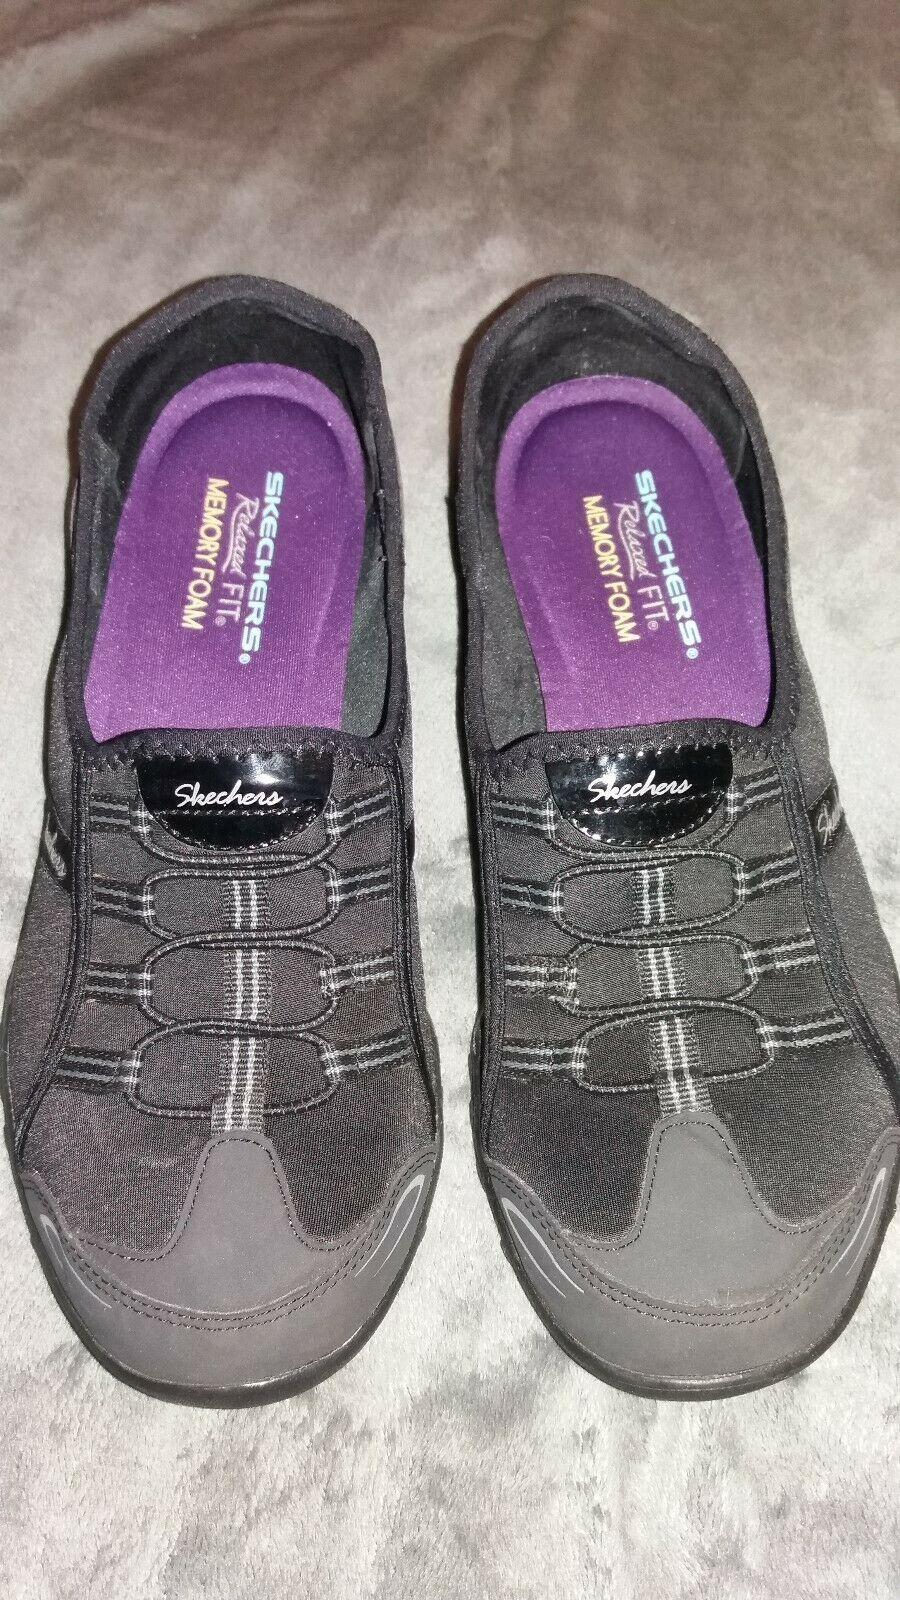 Sketchers Sz 9 Relaxed Fit Memory Foam Slip On Sneakers Black Sketcher Shoes Ideas Of Sketcher Shoes Sketcher Shoe Sketchers Shoes Shoes Slip On Sneakers